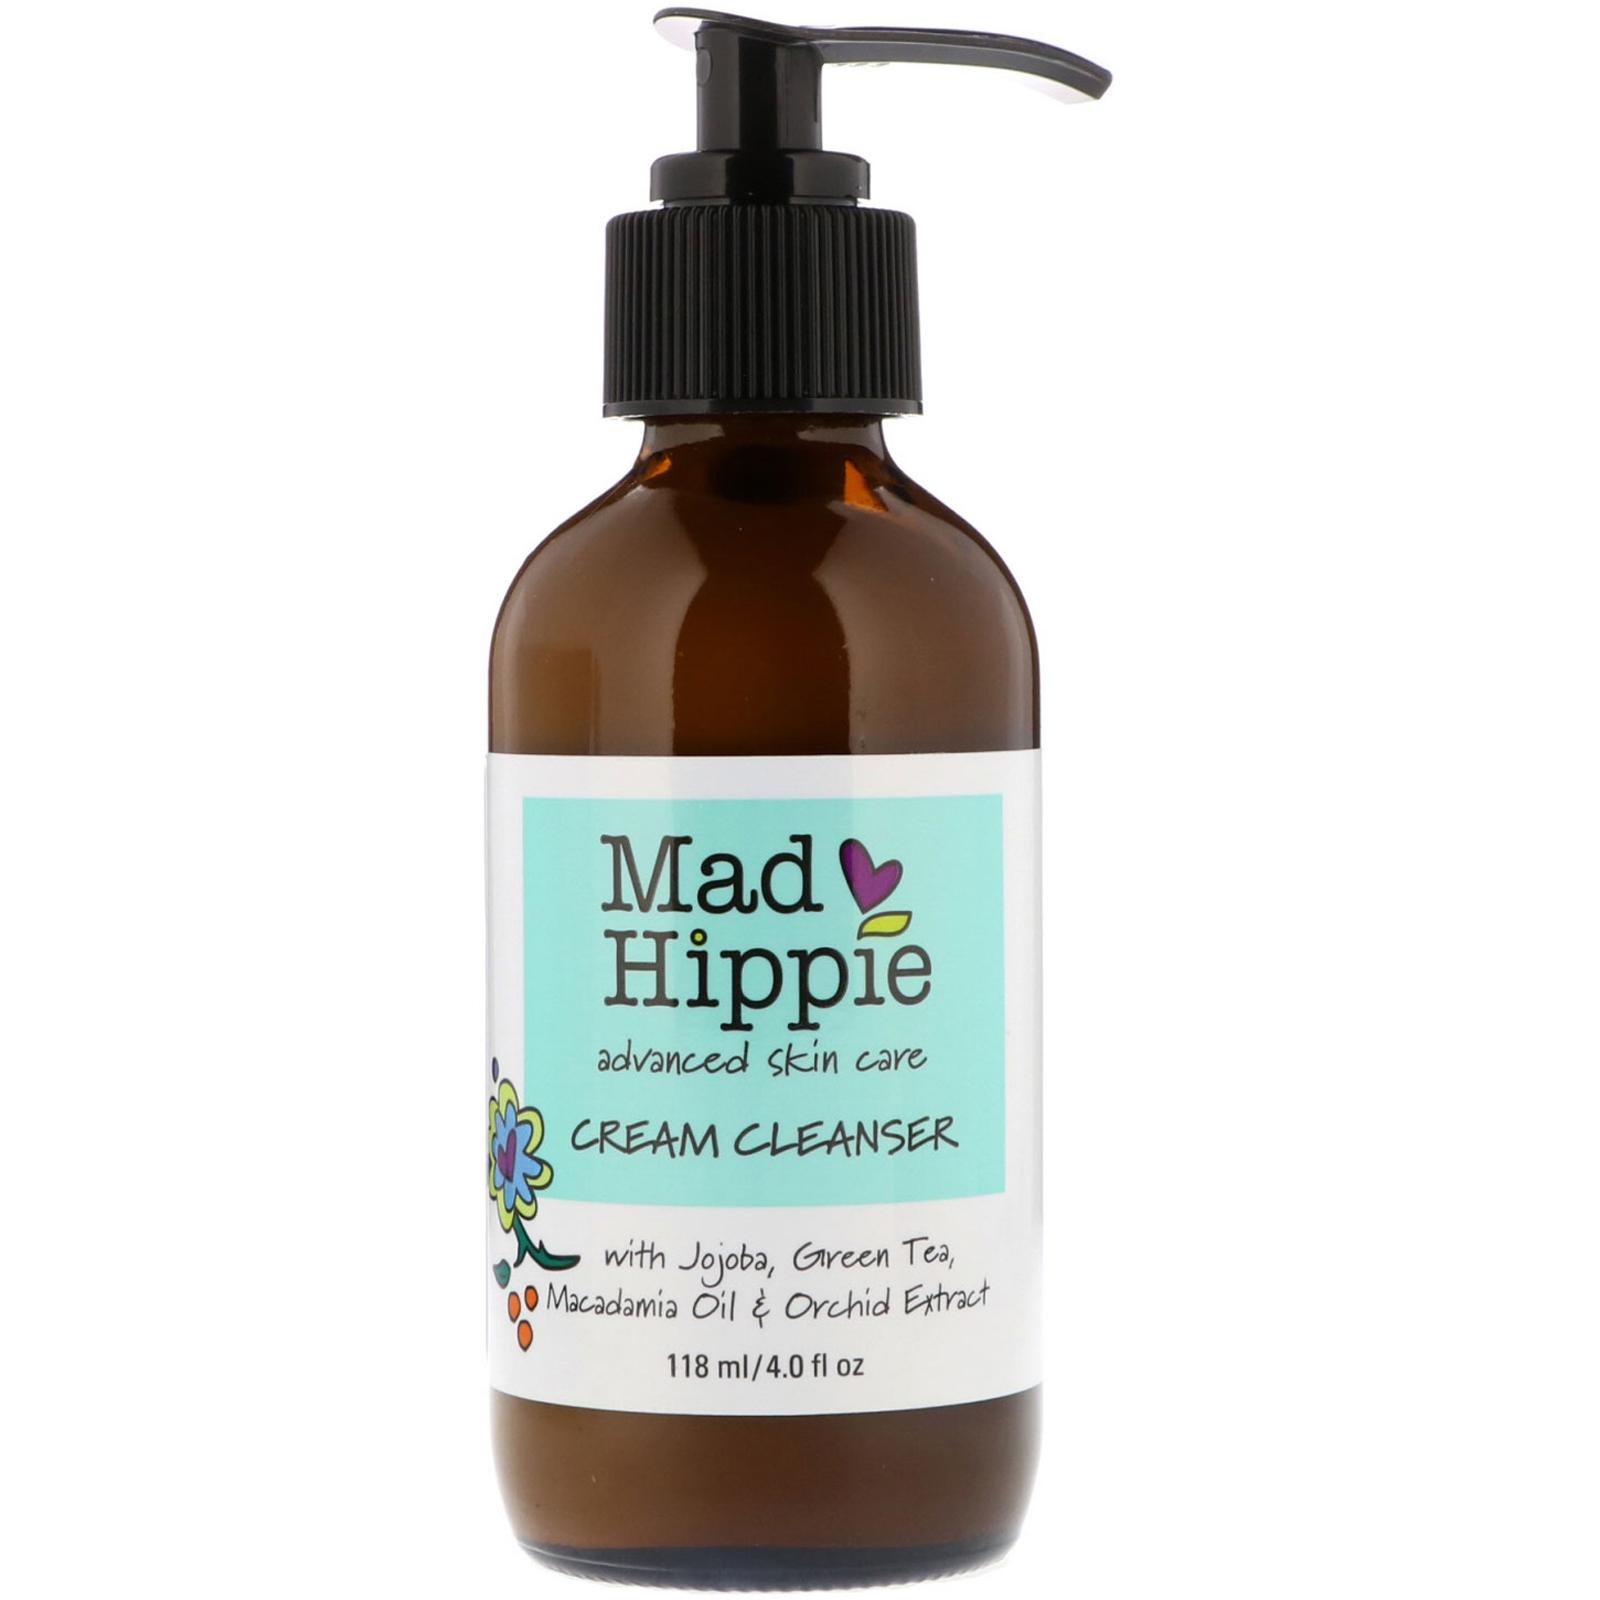 Mad Hippie Cream Cleanser, Normal to Dry Skin 4 fl oz (118 ml) Suki Skincare Nourishing Day Cream 1 oz